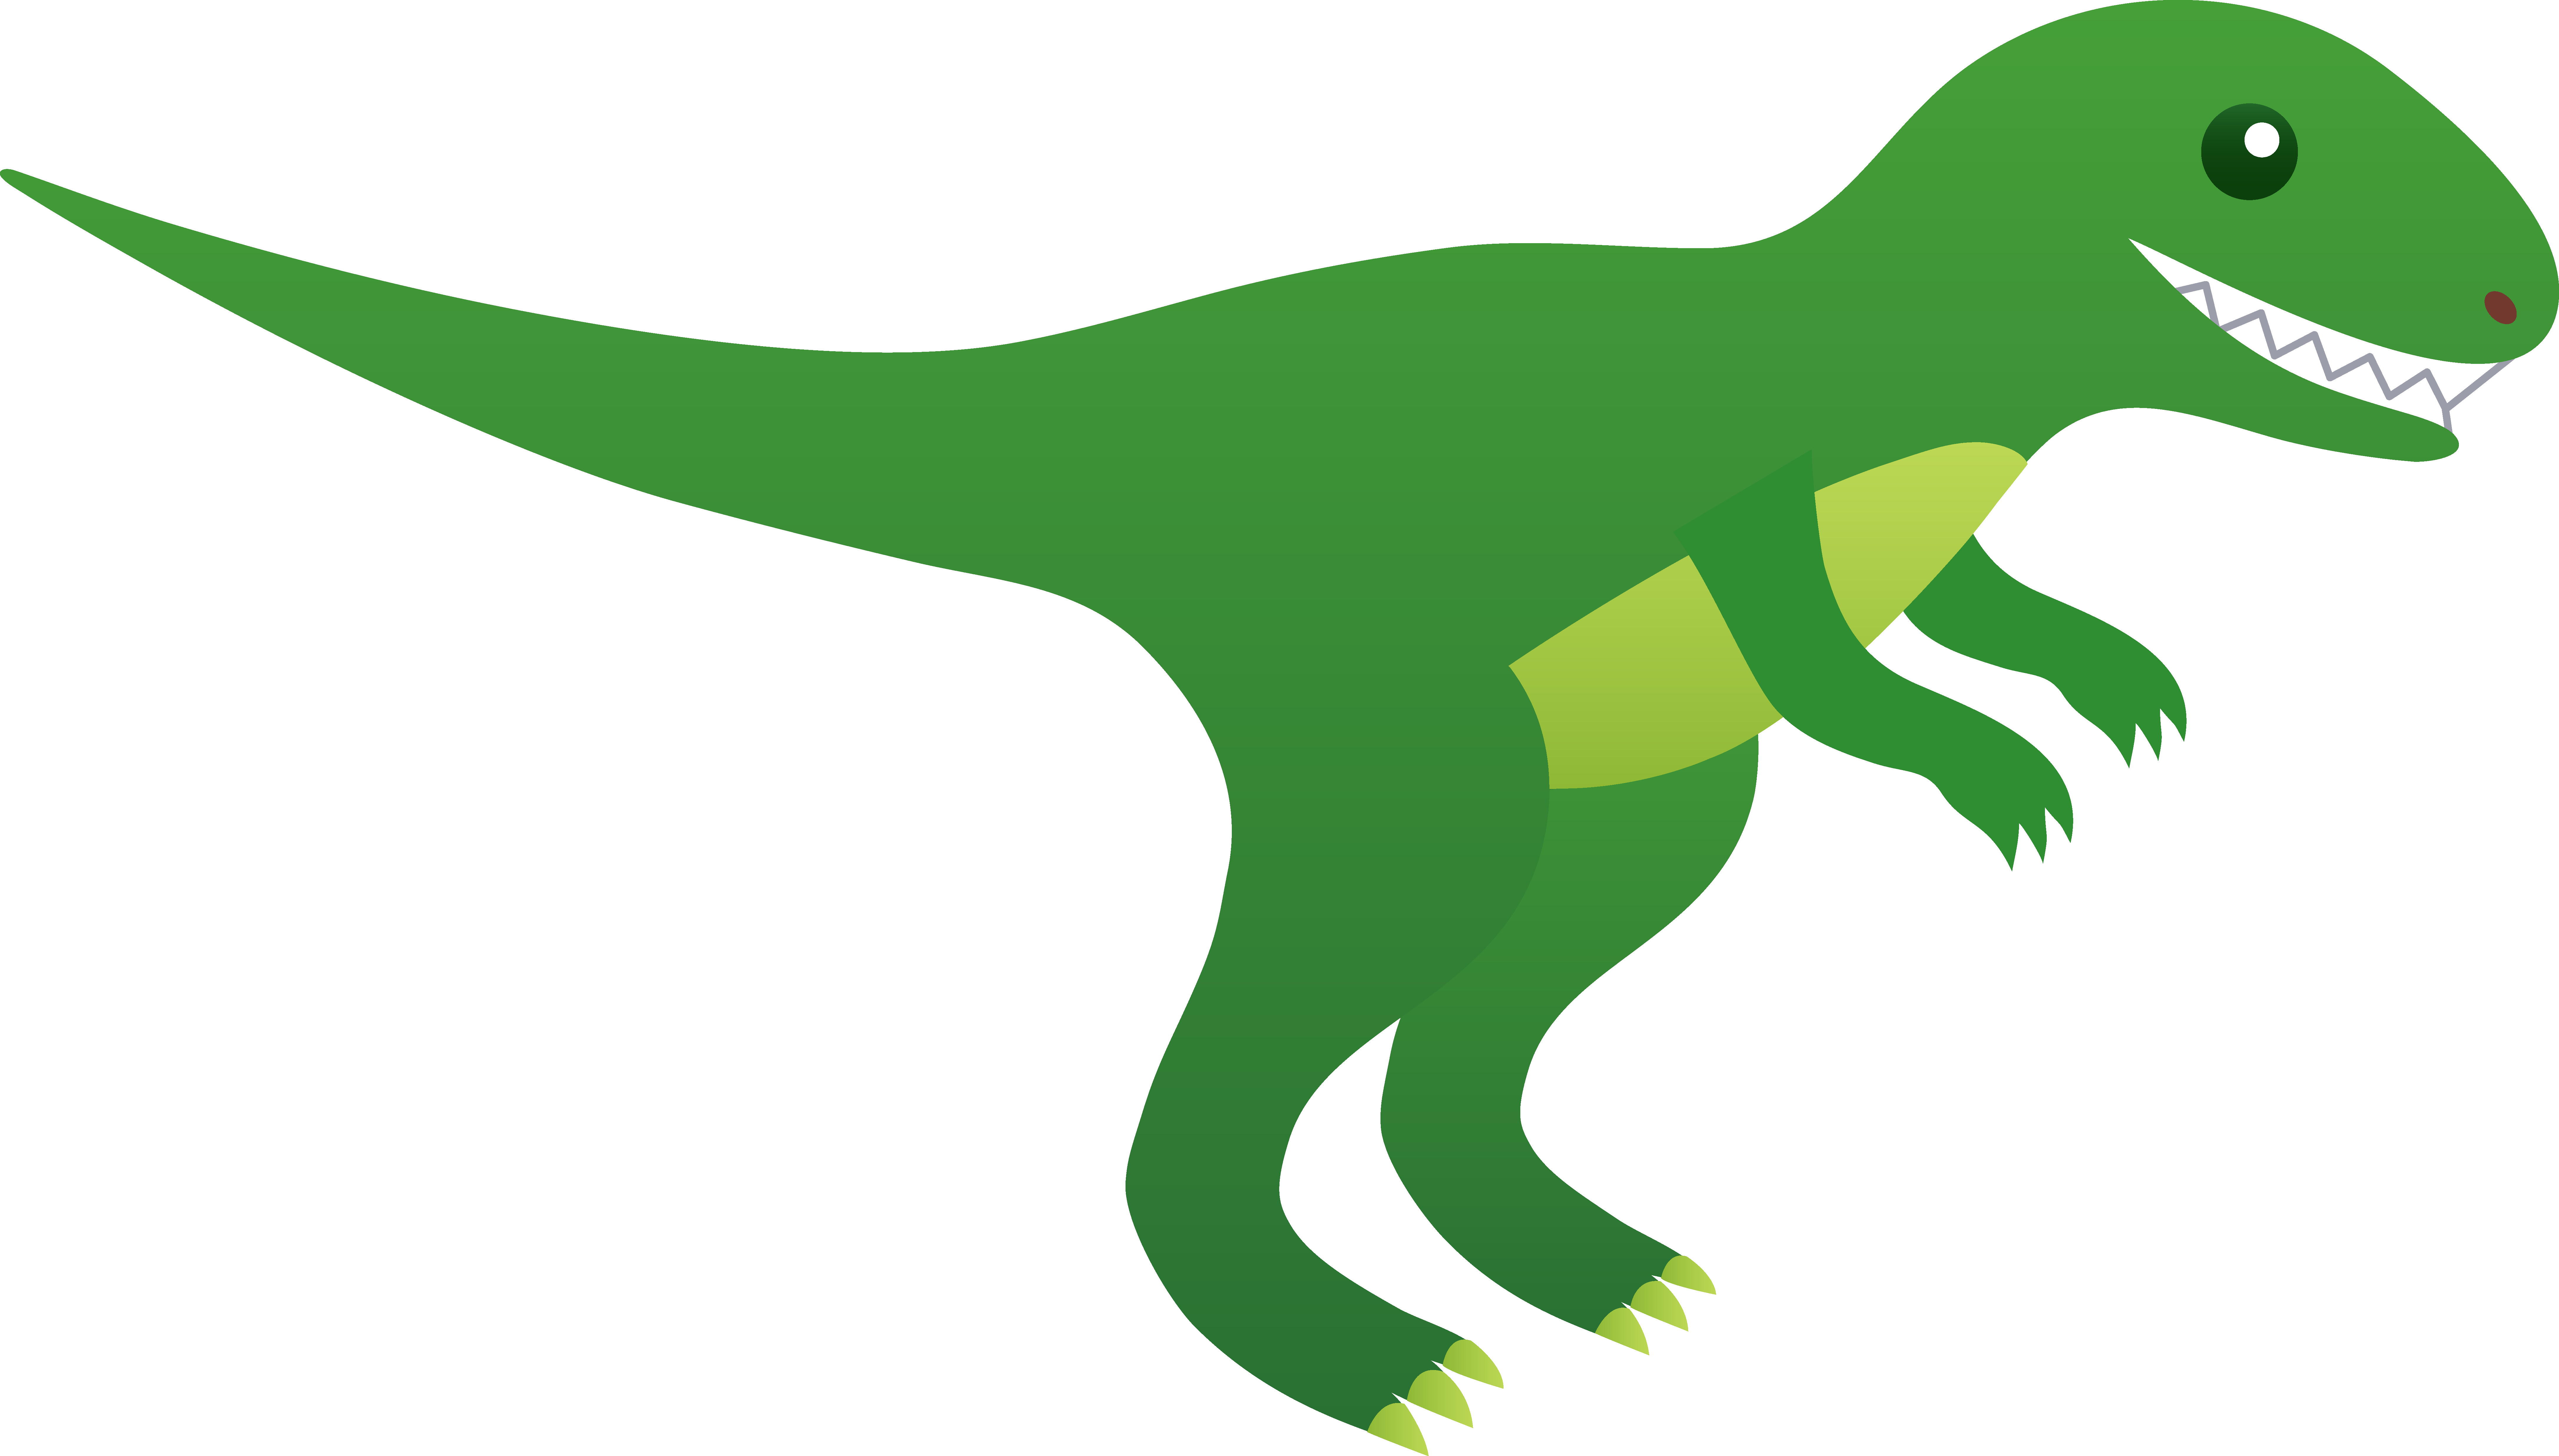 T Rex Dinosaur Free Clipart-T Rex Dinosaur Free Clipart-16